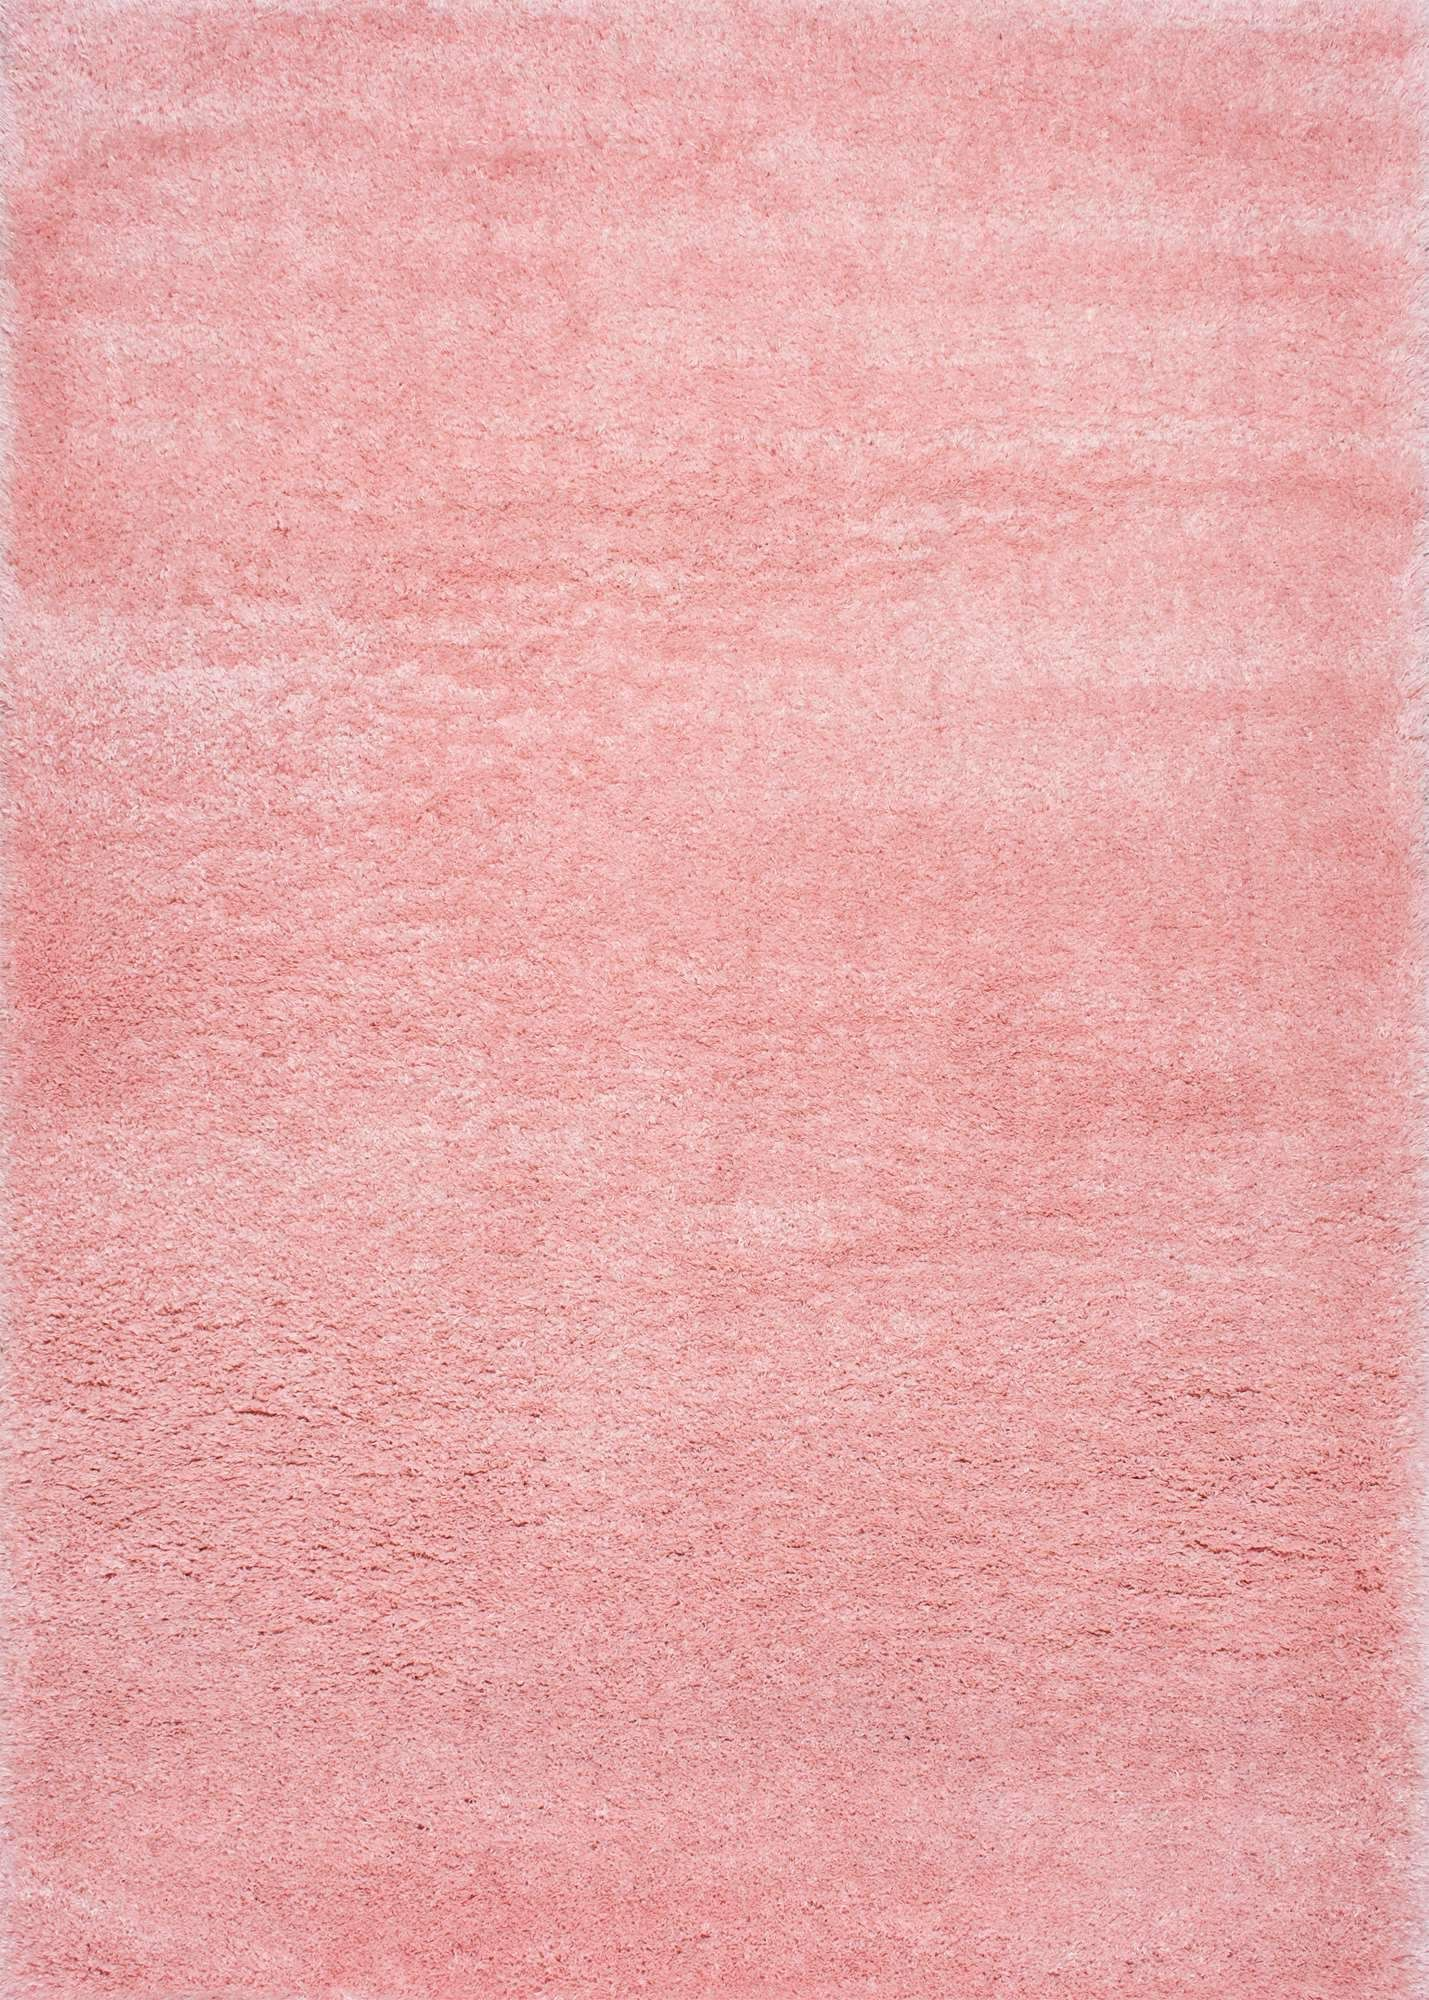 Nuloom gynel cloudy shag ozase area rug products